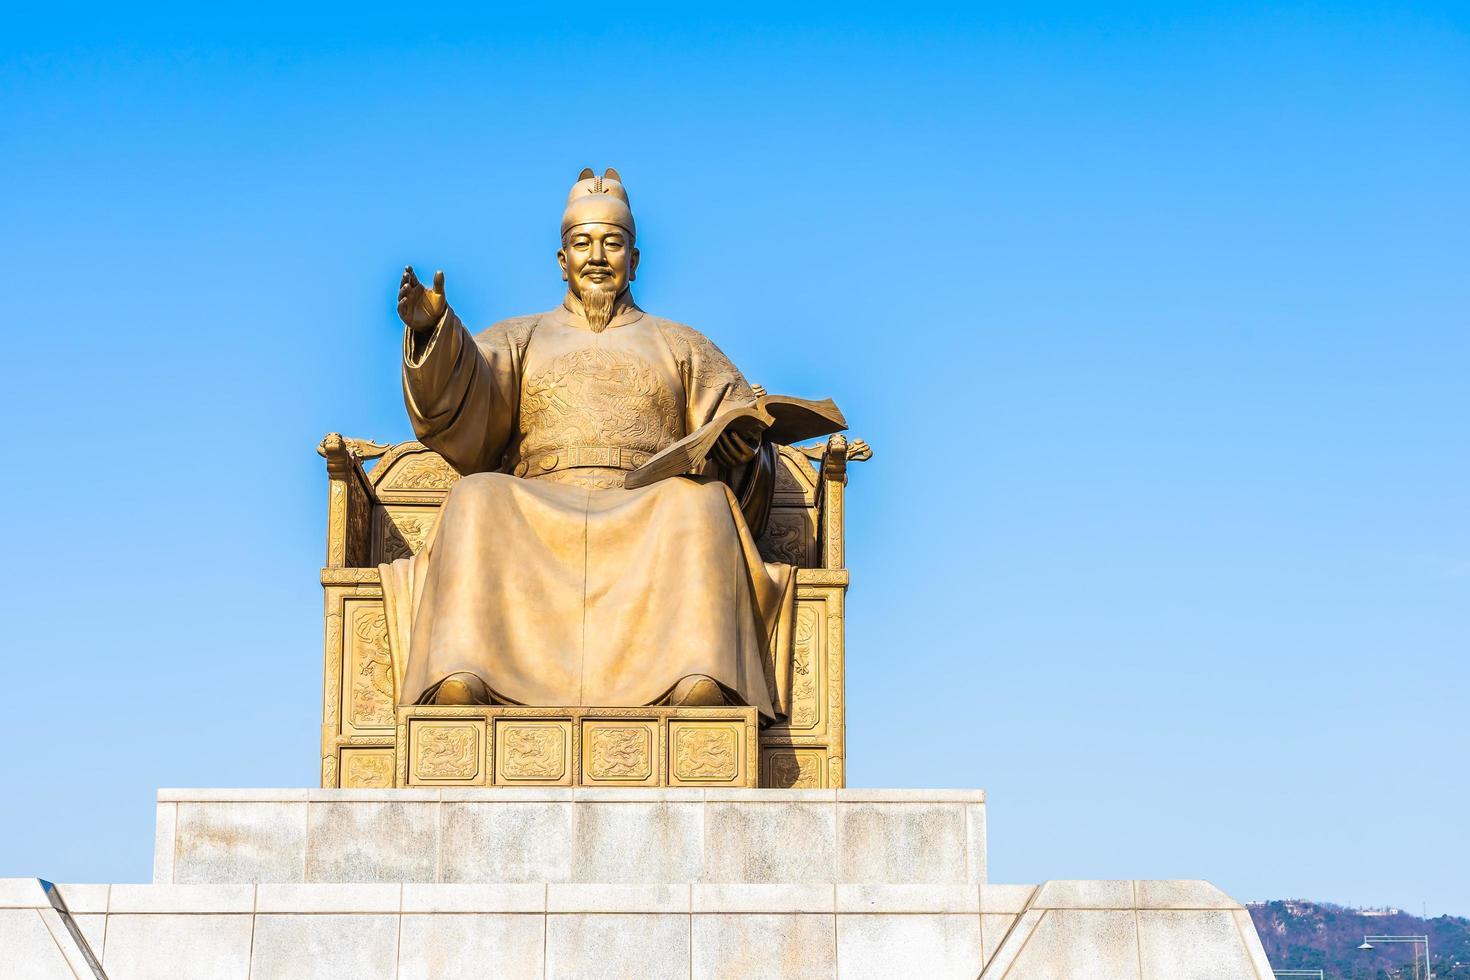 Statue des Königs Sejong in Seoul, Südkorea foto